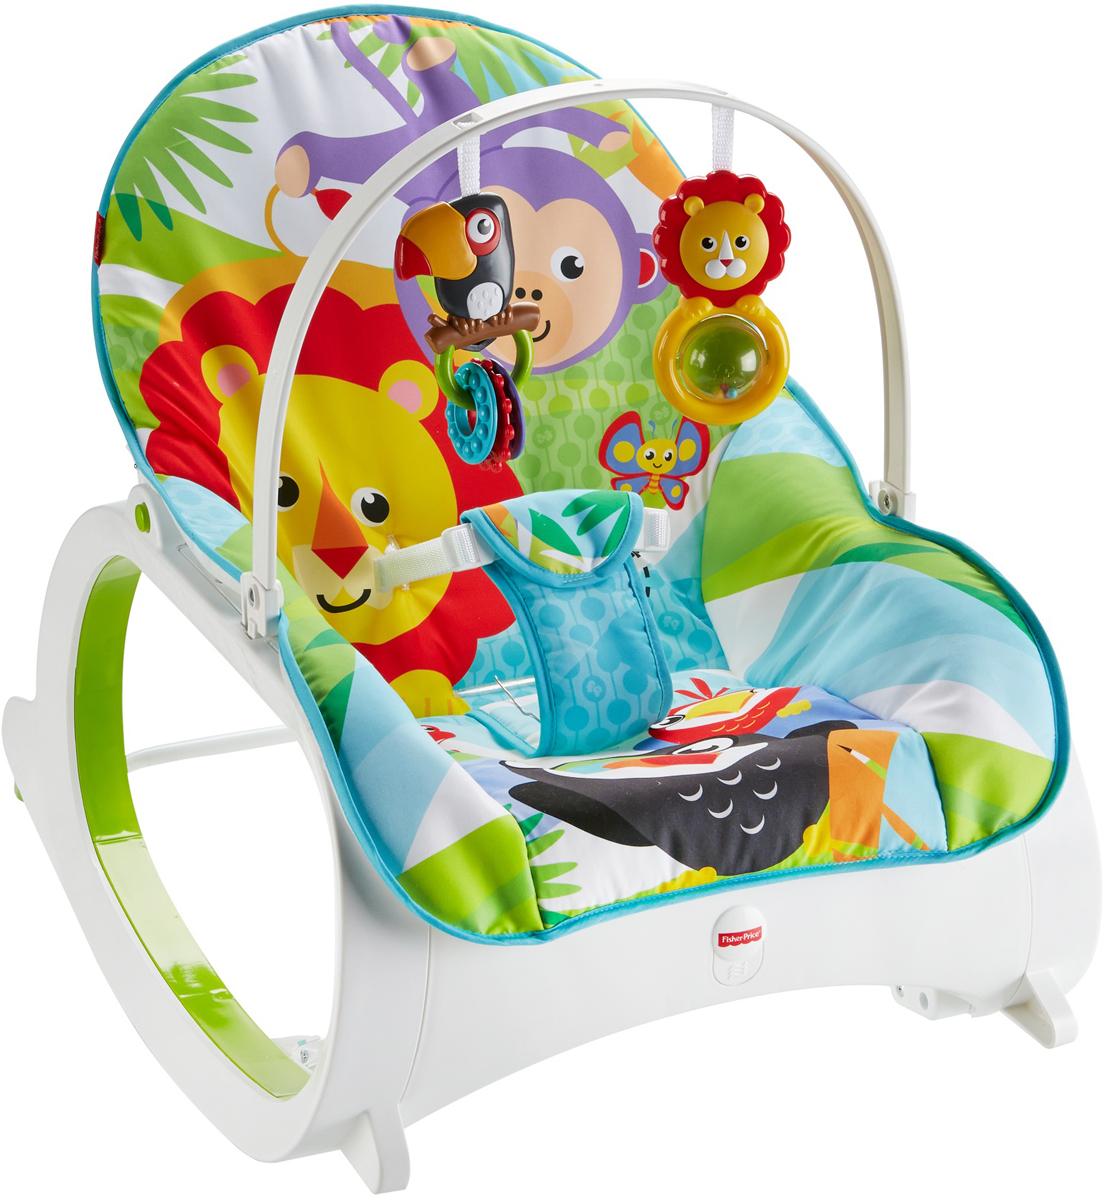 Fisher-Price Core Кресло-качалка детское Растем вместе -  Ходунки, прыгунки, качалки